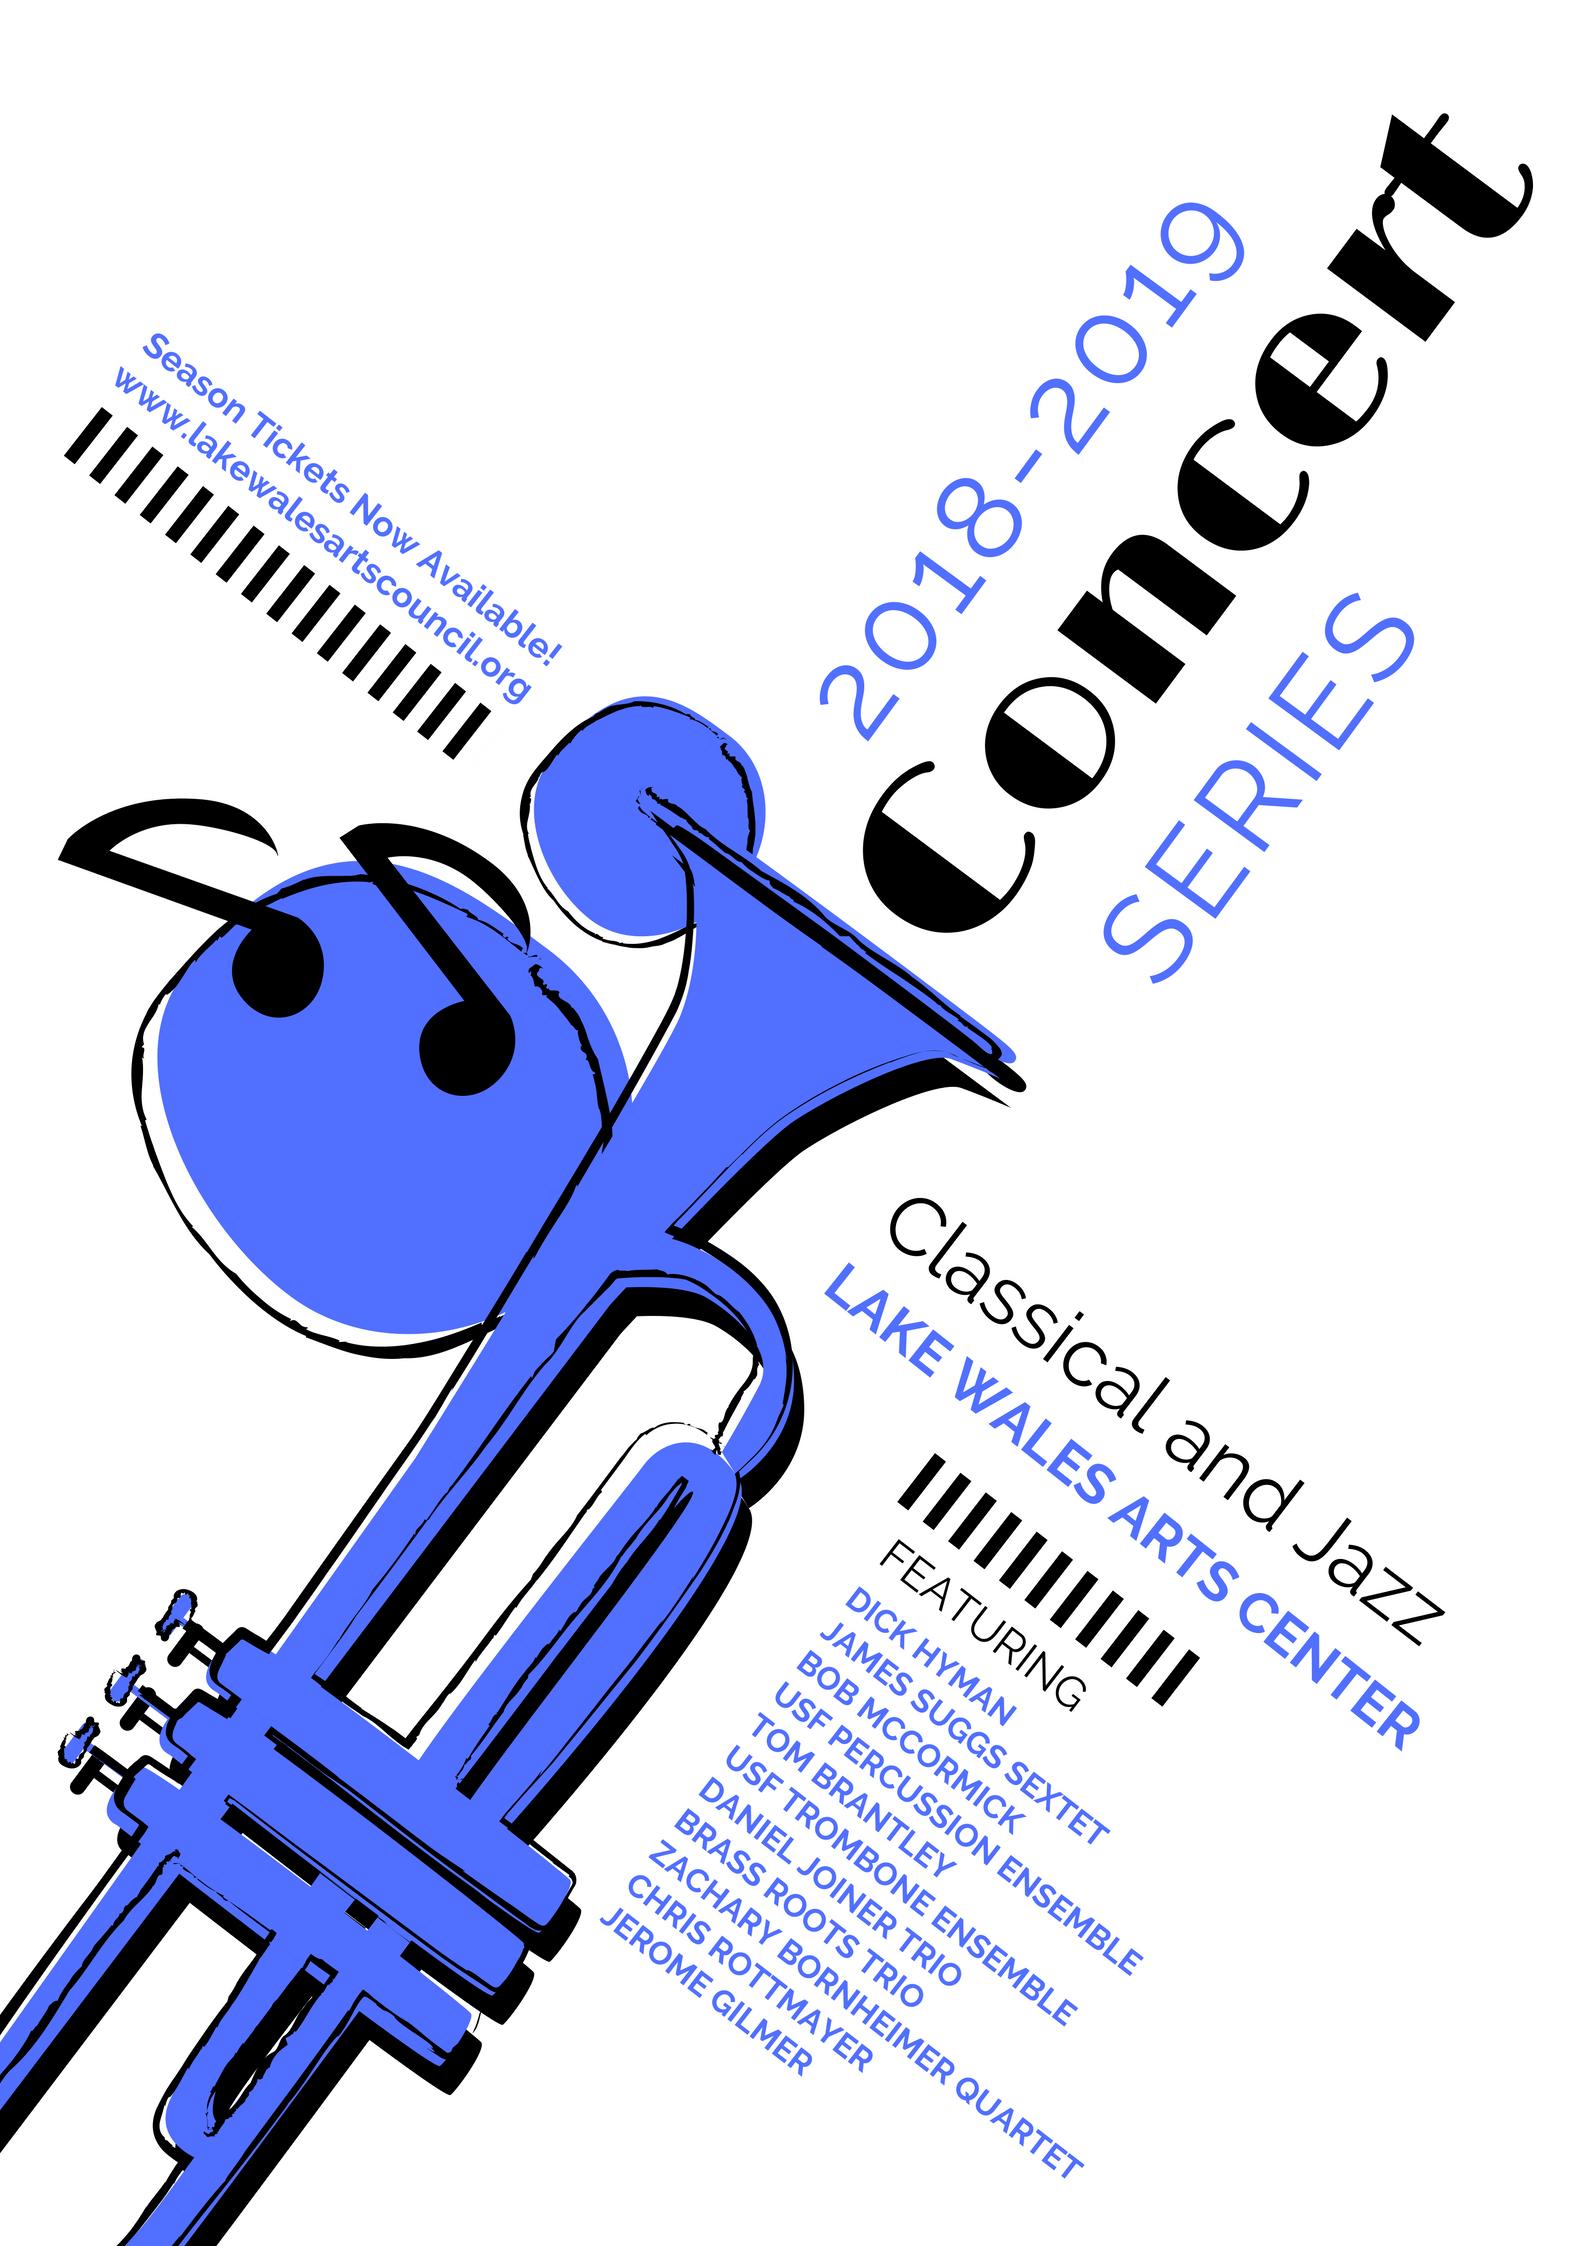 2018_concertseriesflyer_updated1.jpg